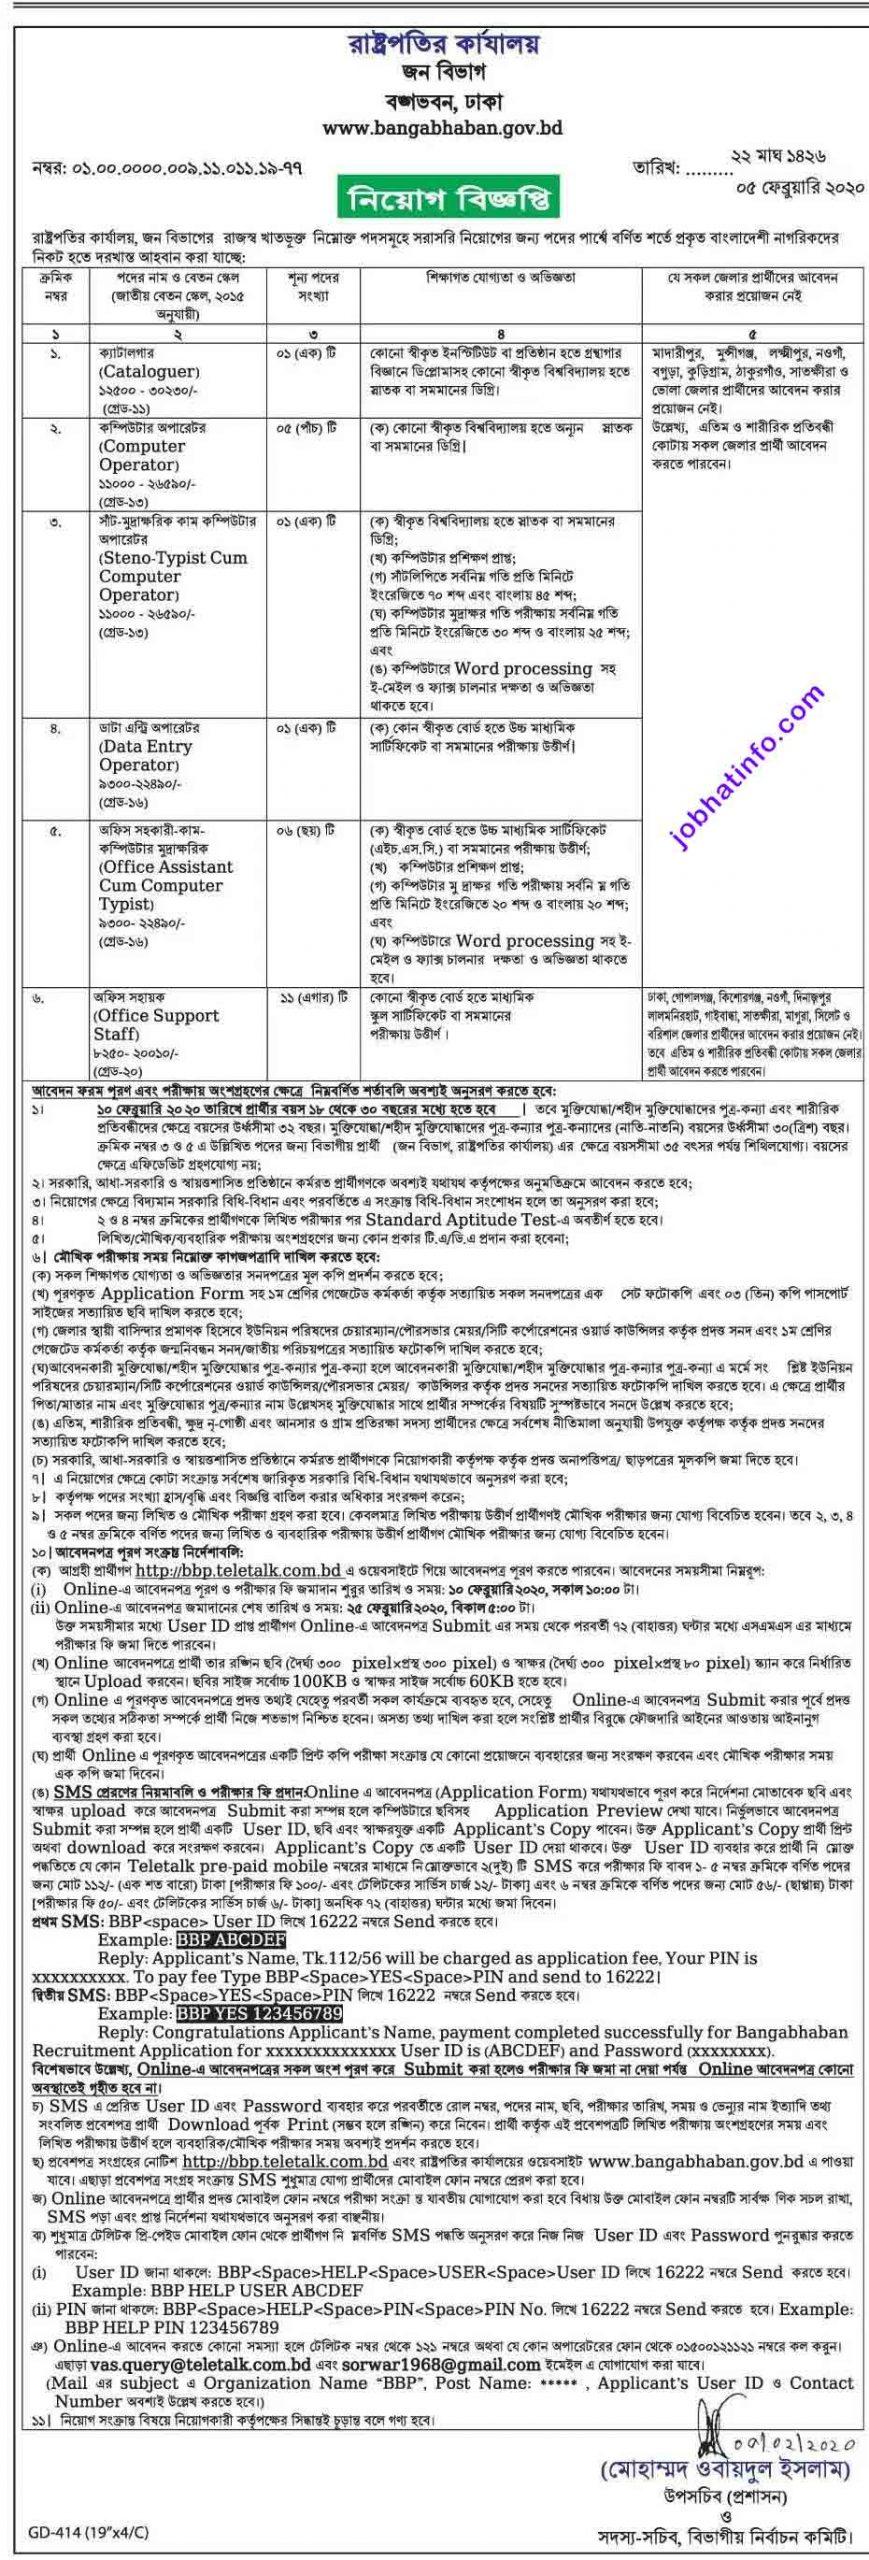 Bangabhaban Job Circular- Apply teletalk.com.bd 2